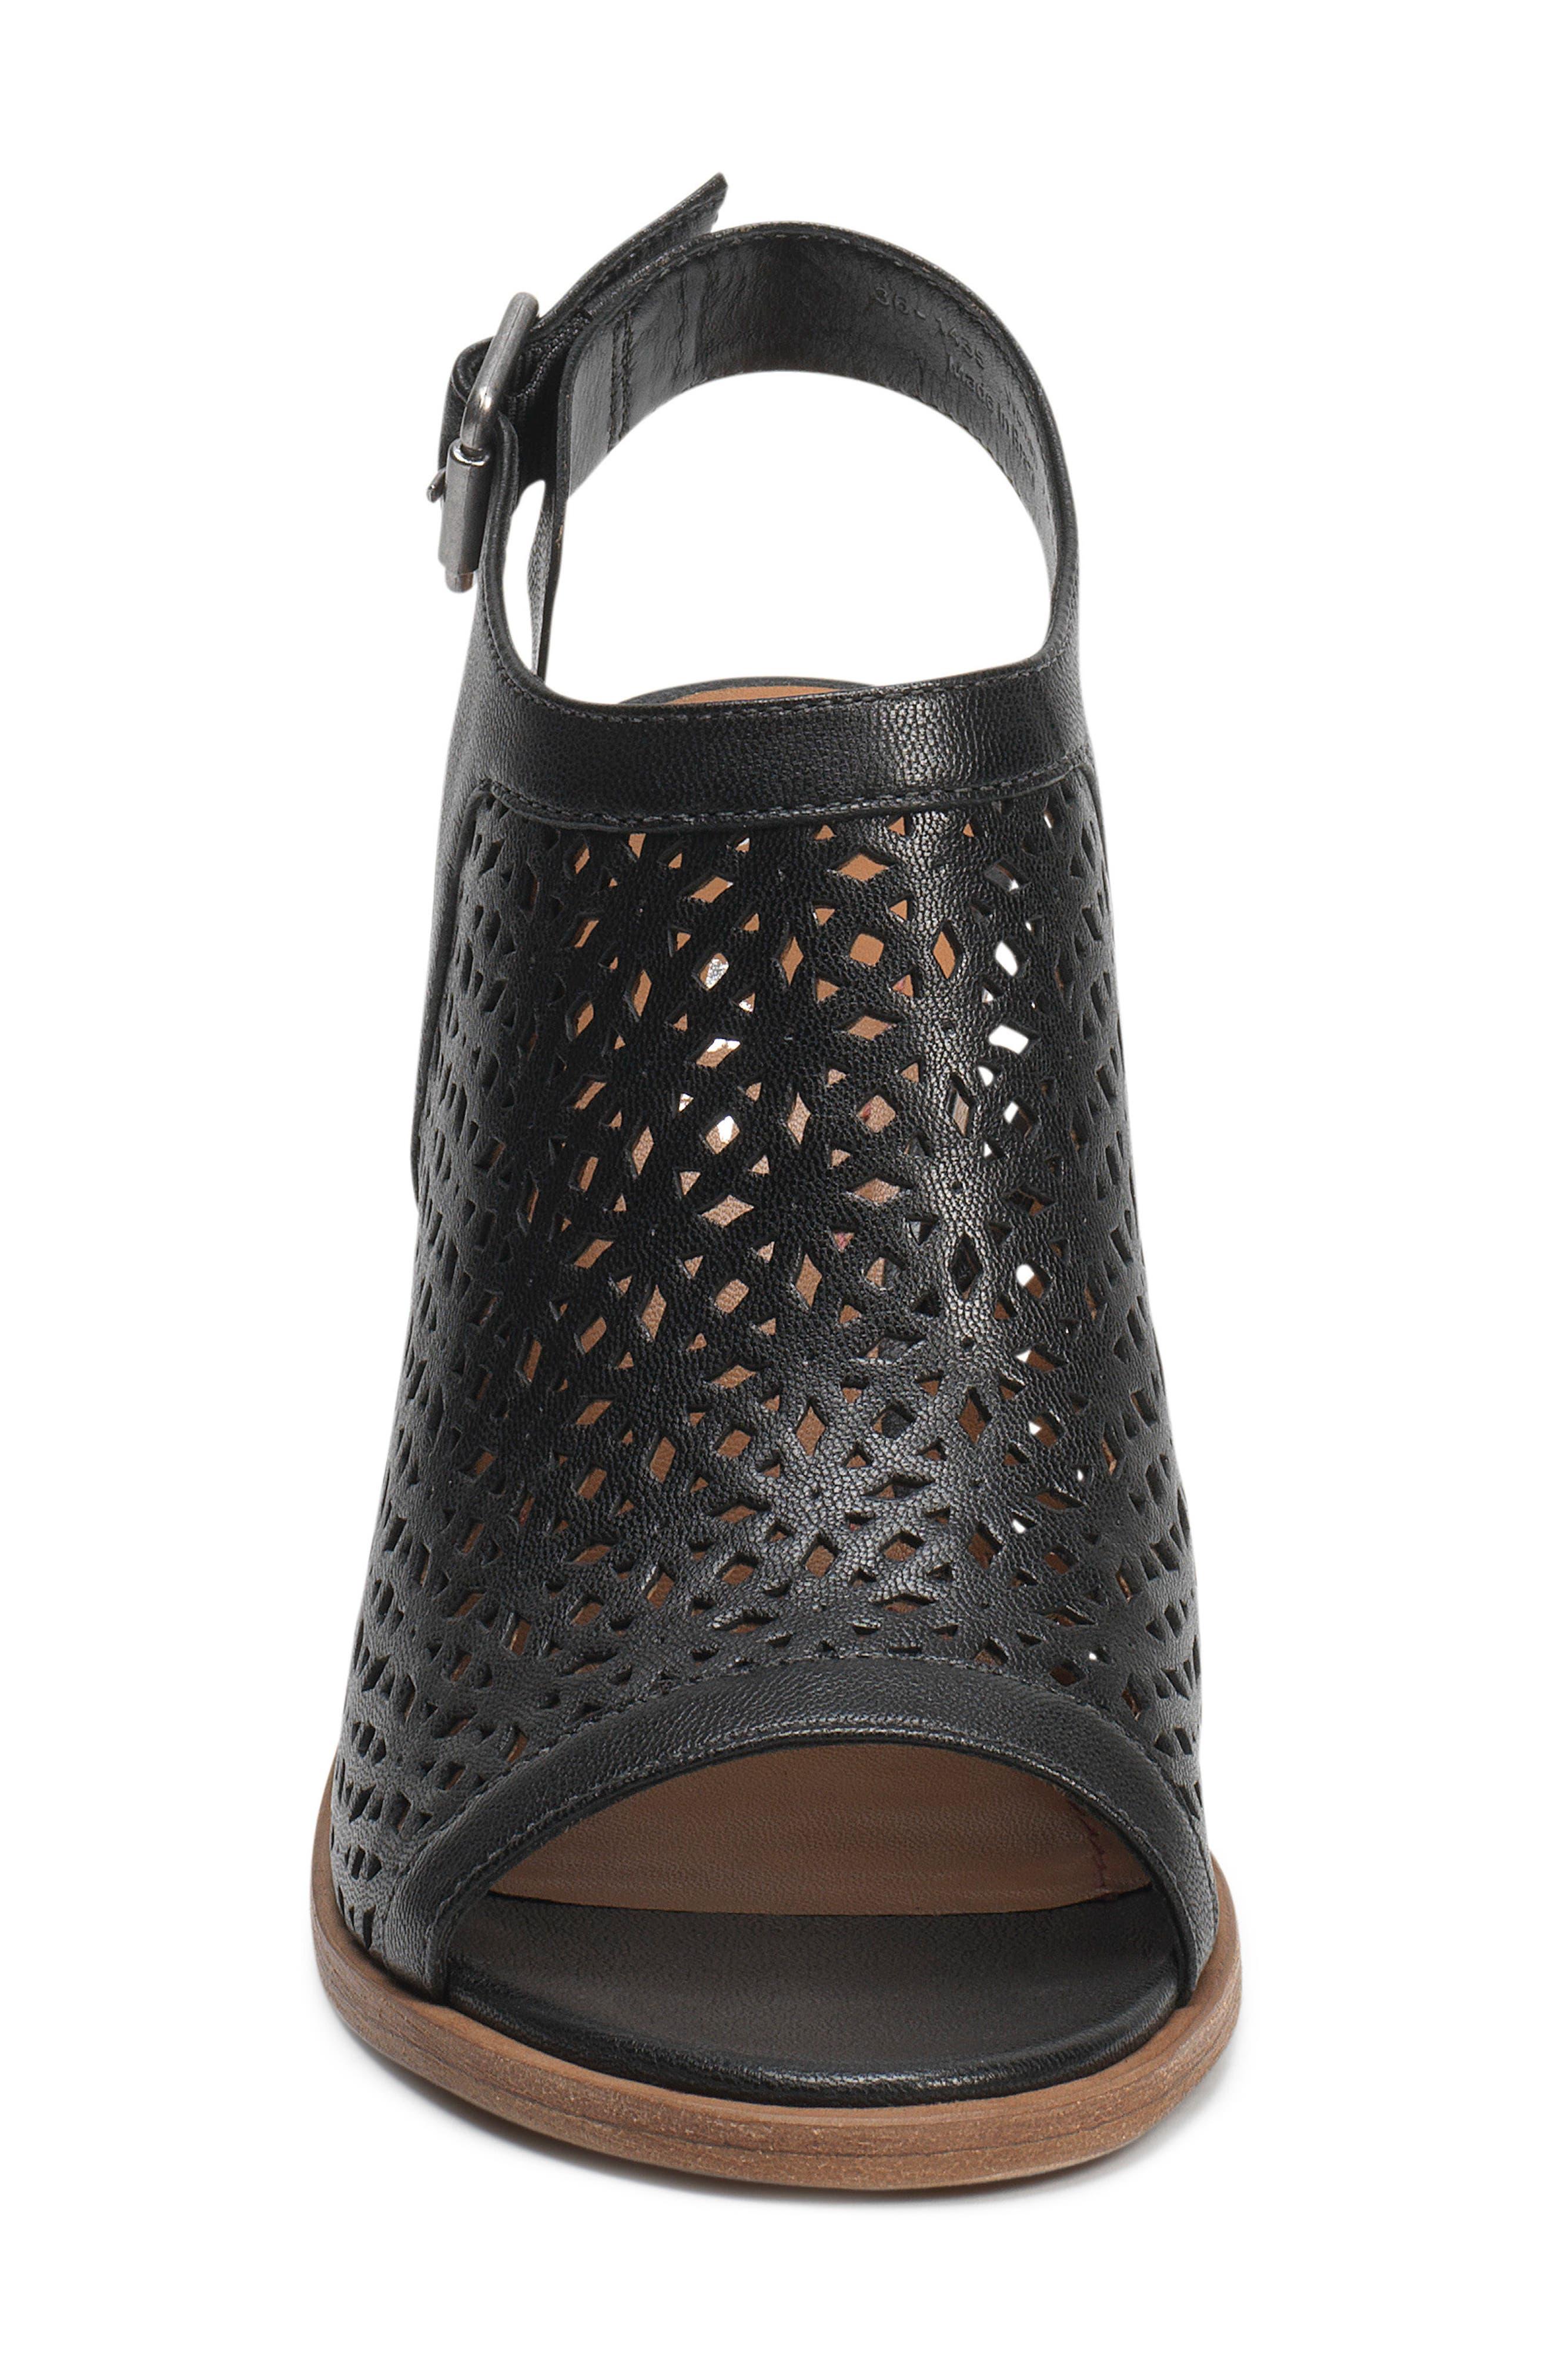 Parker Slingback Sandal,                             Alternate thumbnail 4, color,                             Black Leather